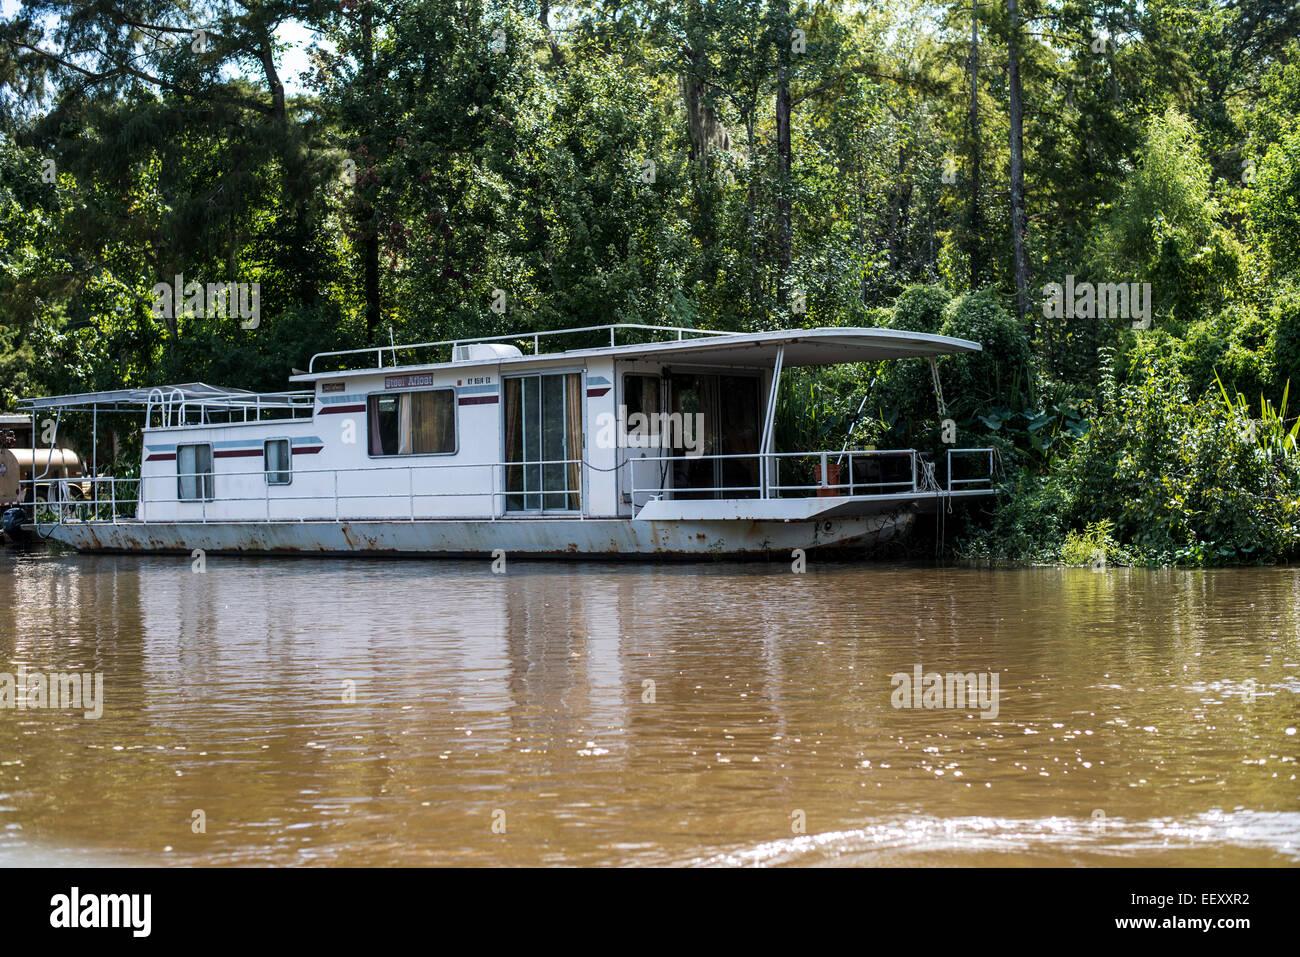 Louisiana Swamp Land Delta Wetlands Mississippi River